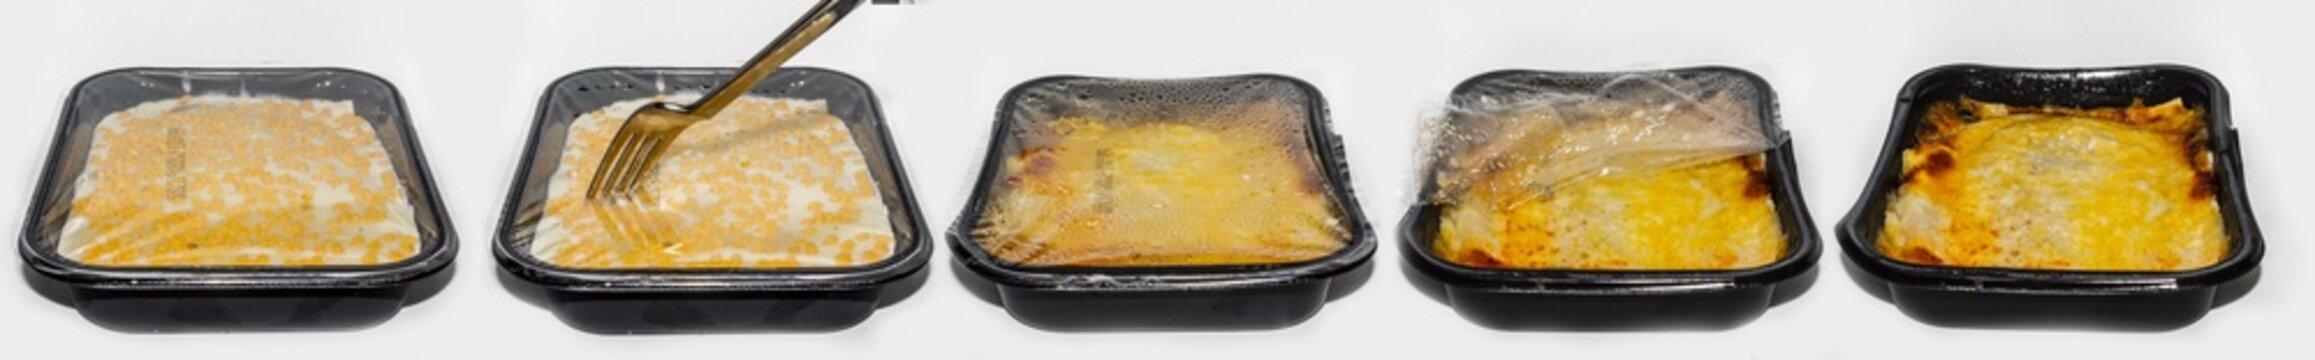 microwave food lasagna